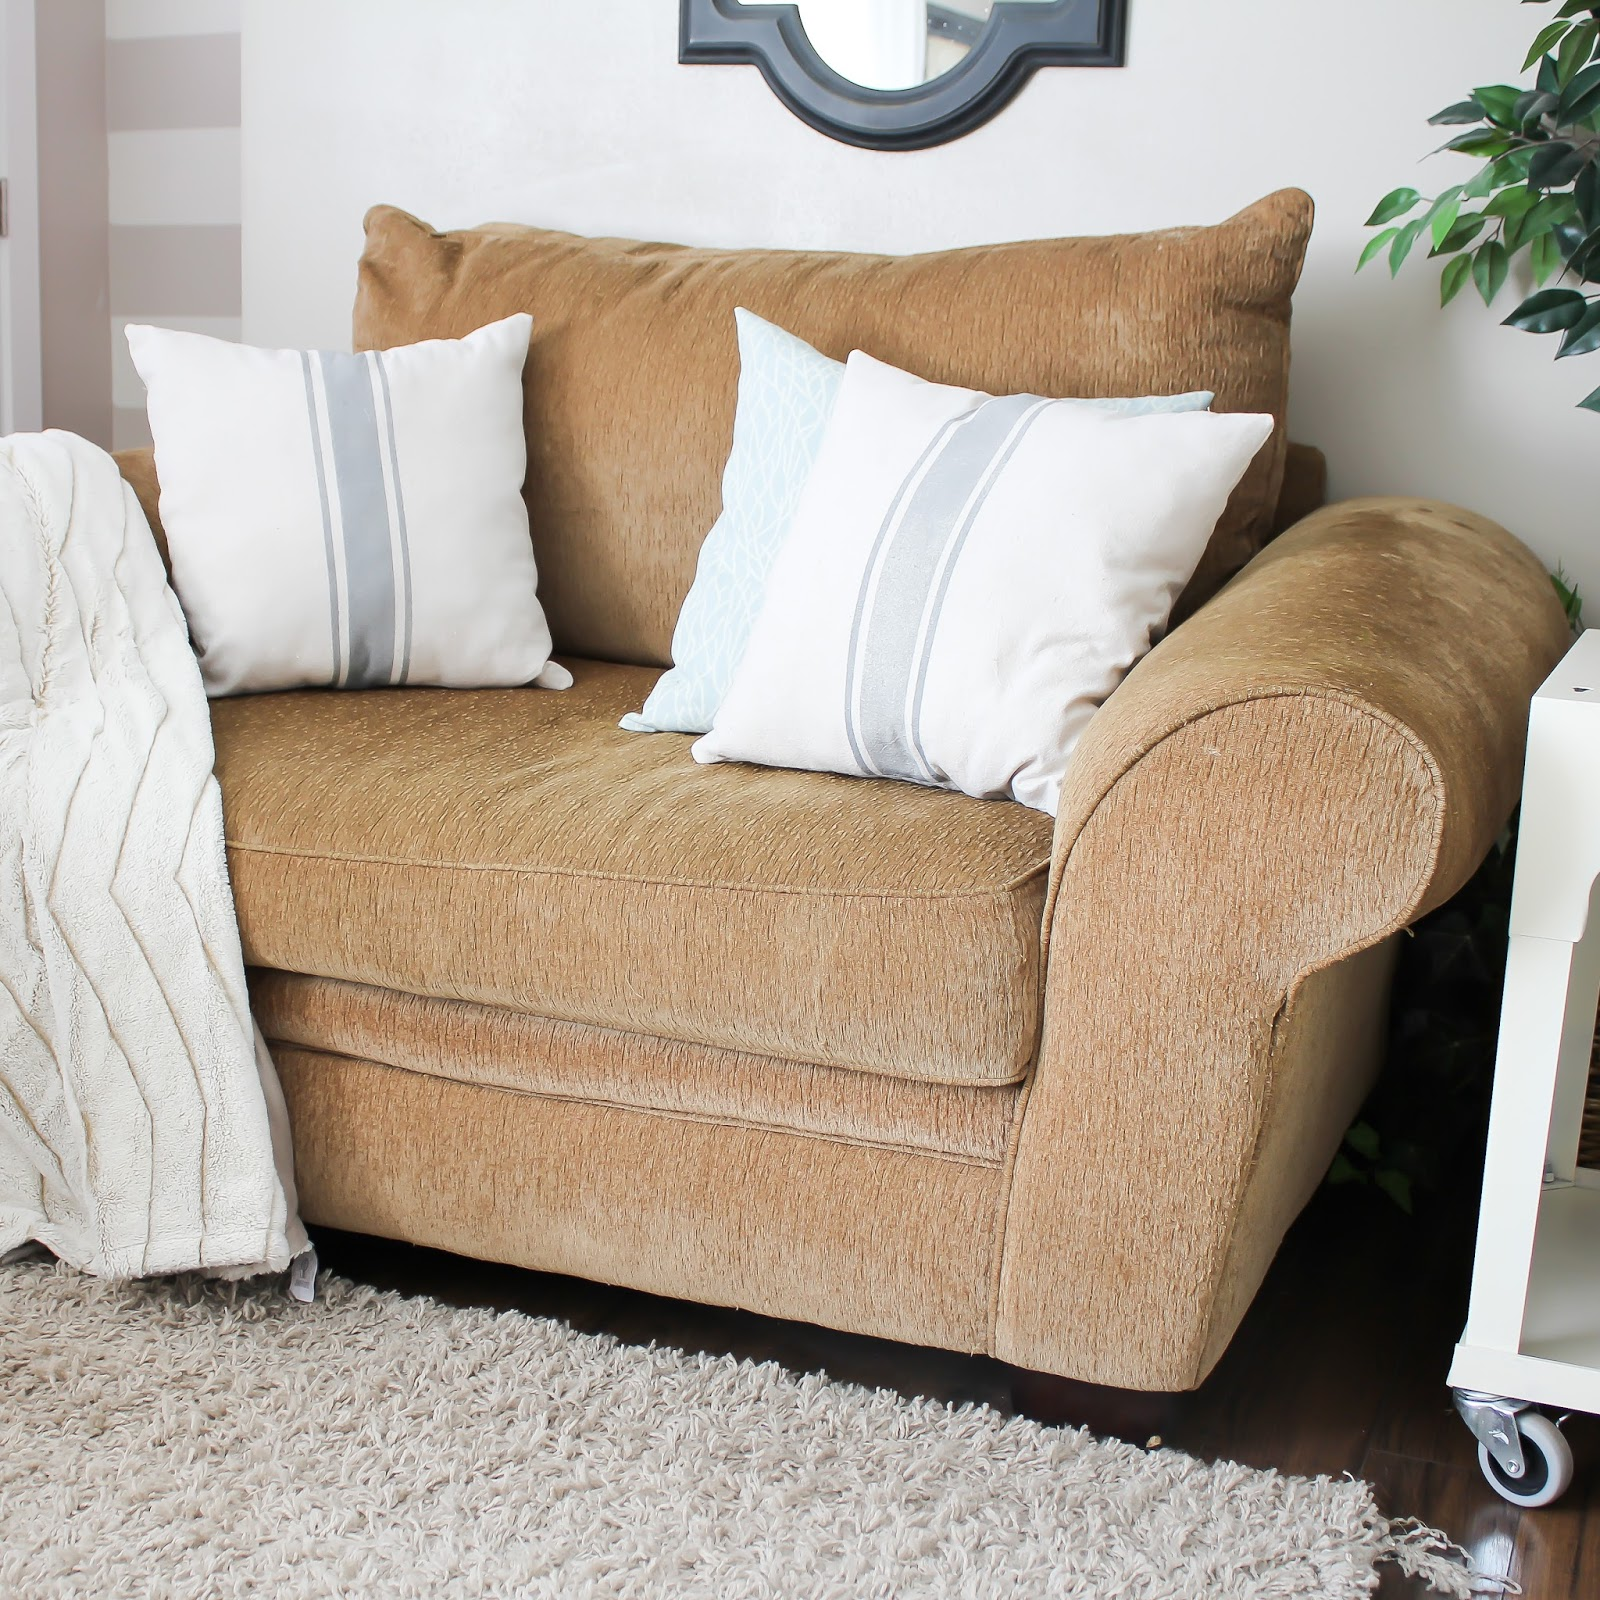 DIY Grain Sack Pillows, easy to make using fabric spray paint!